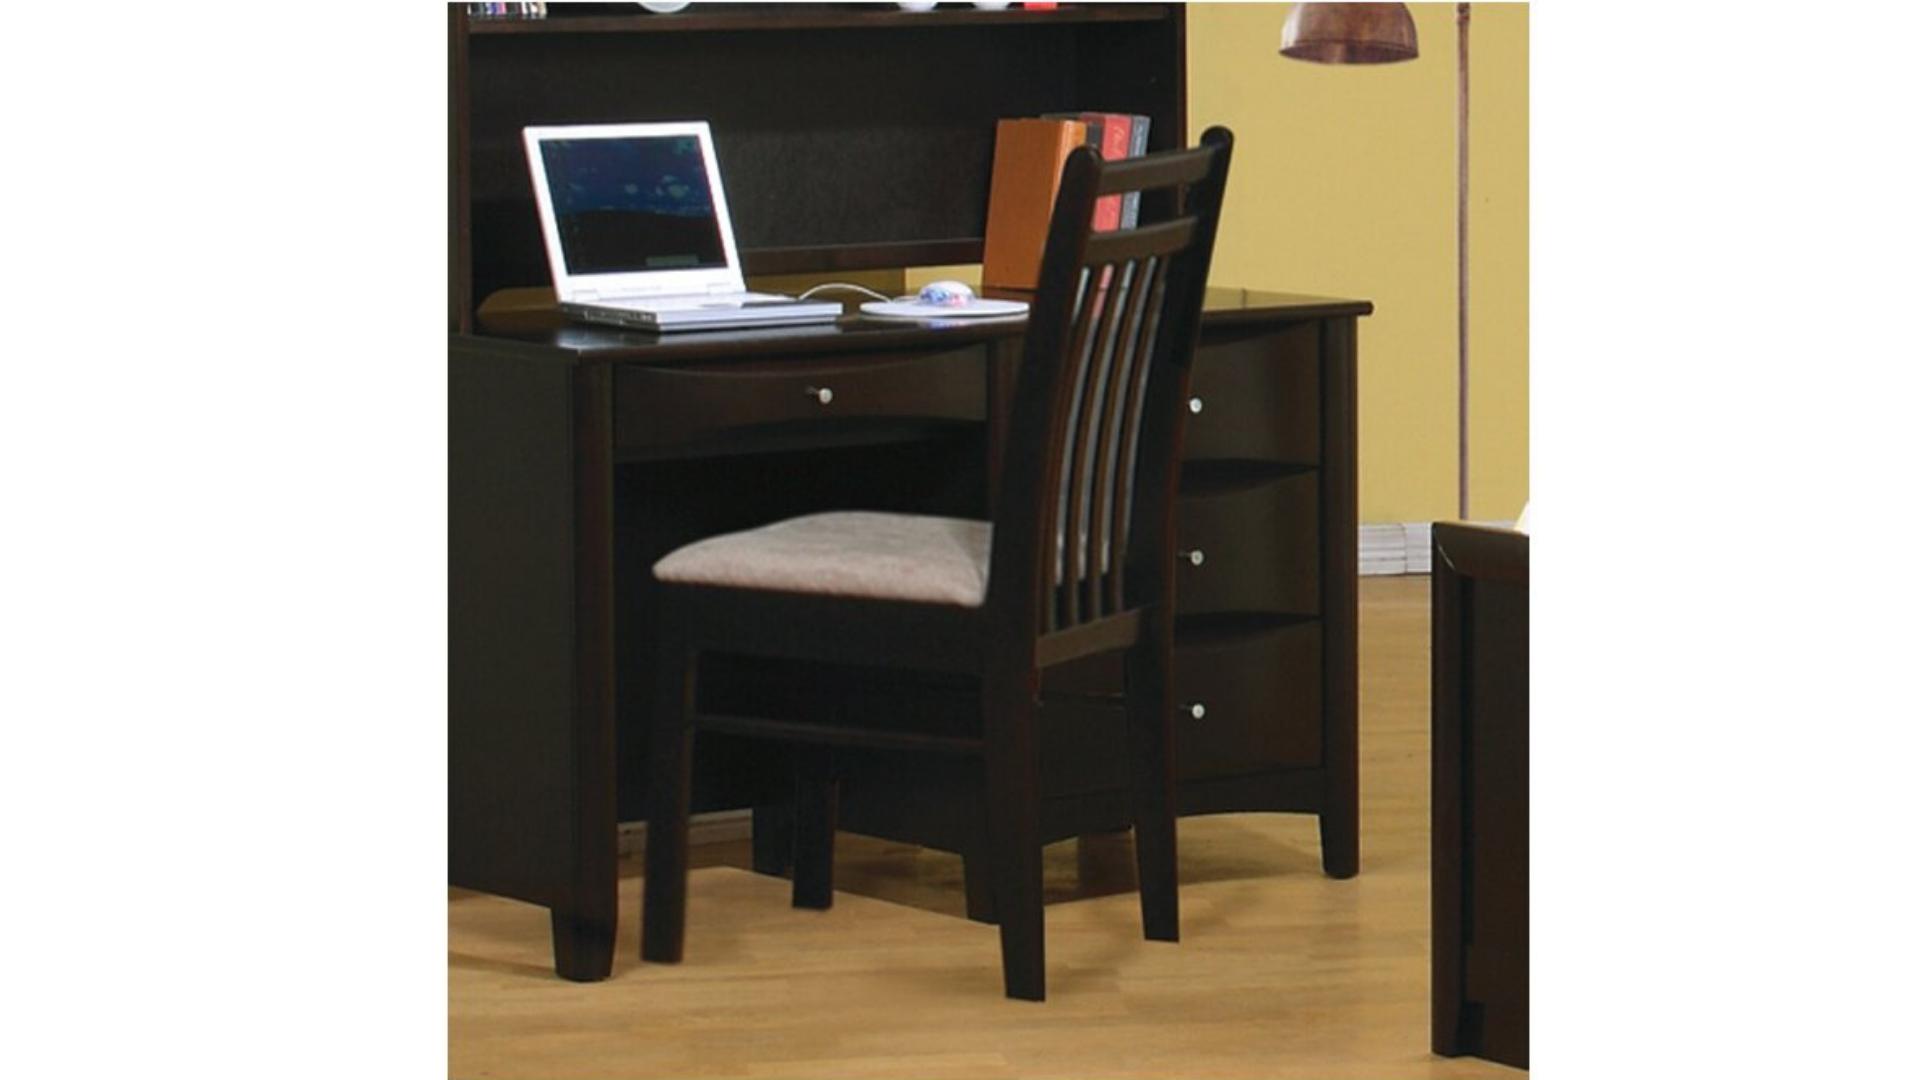 Orren Ellis best desk chair with no wheels